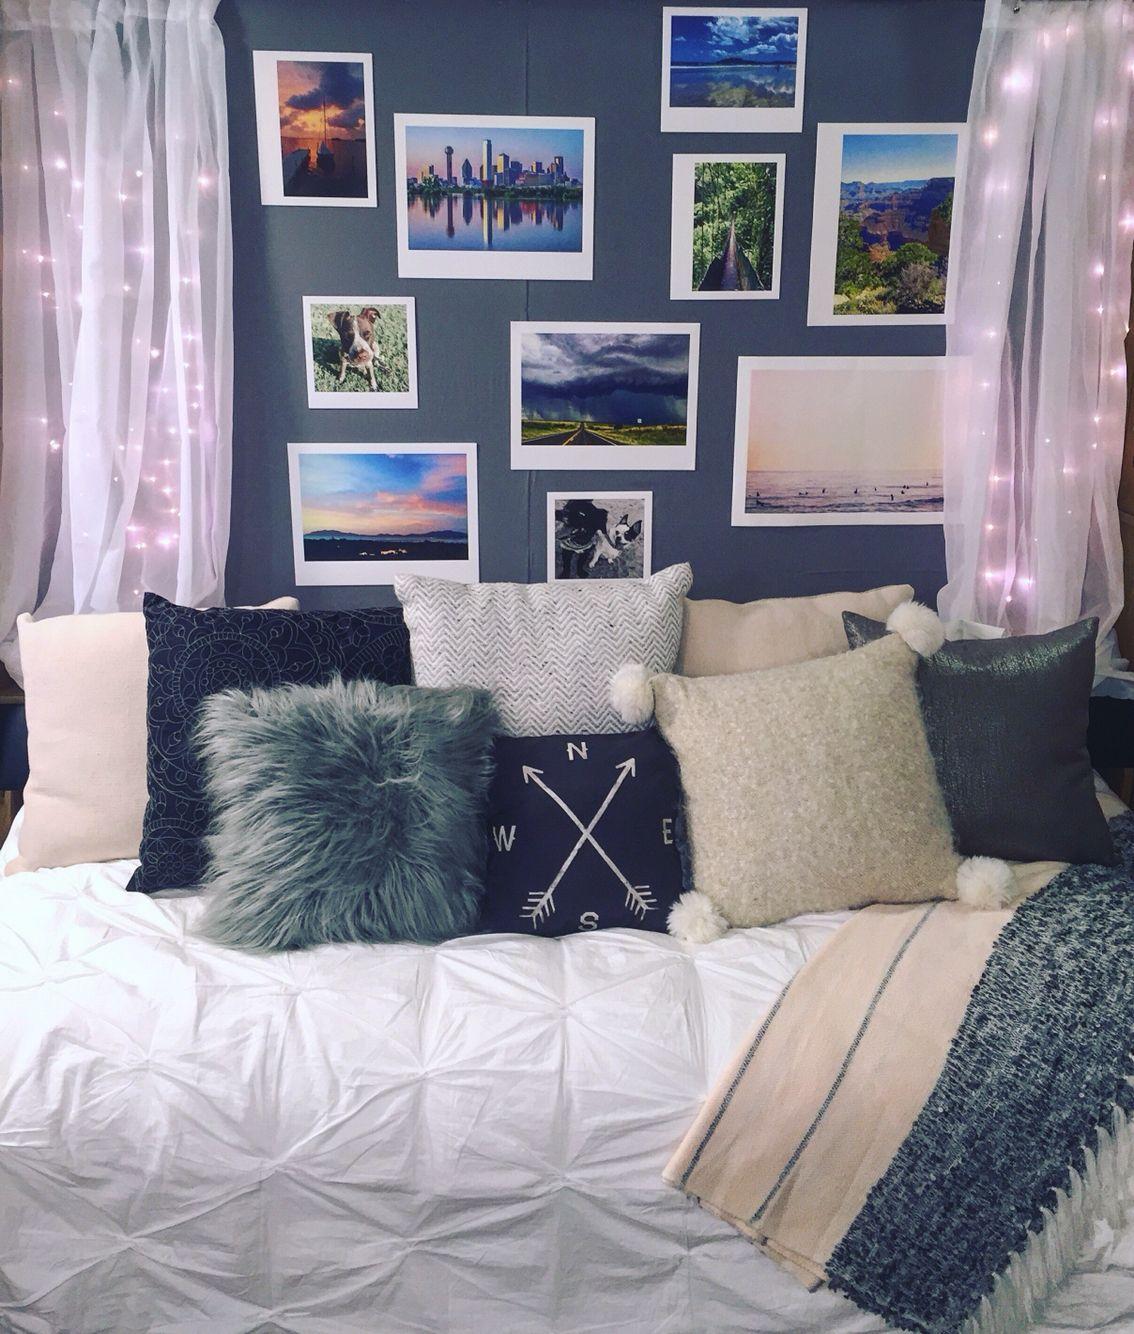 Texas Tech Stangel Dorm Sarahs College Apartment Pinterest - College apartment bedrooms